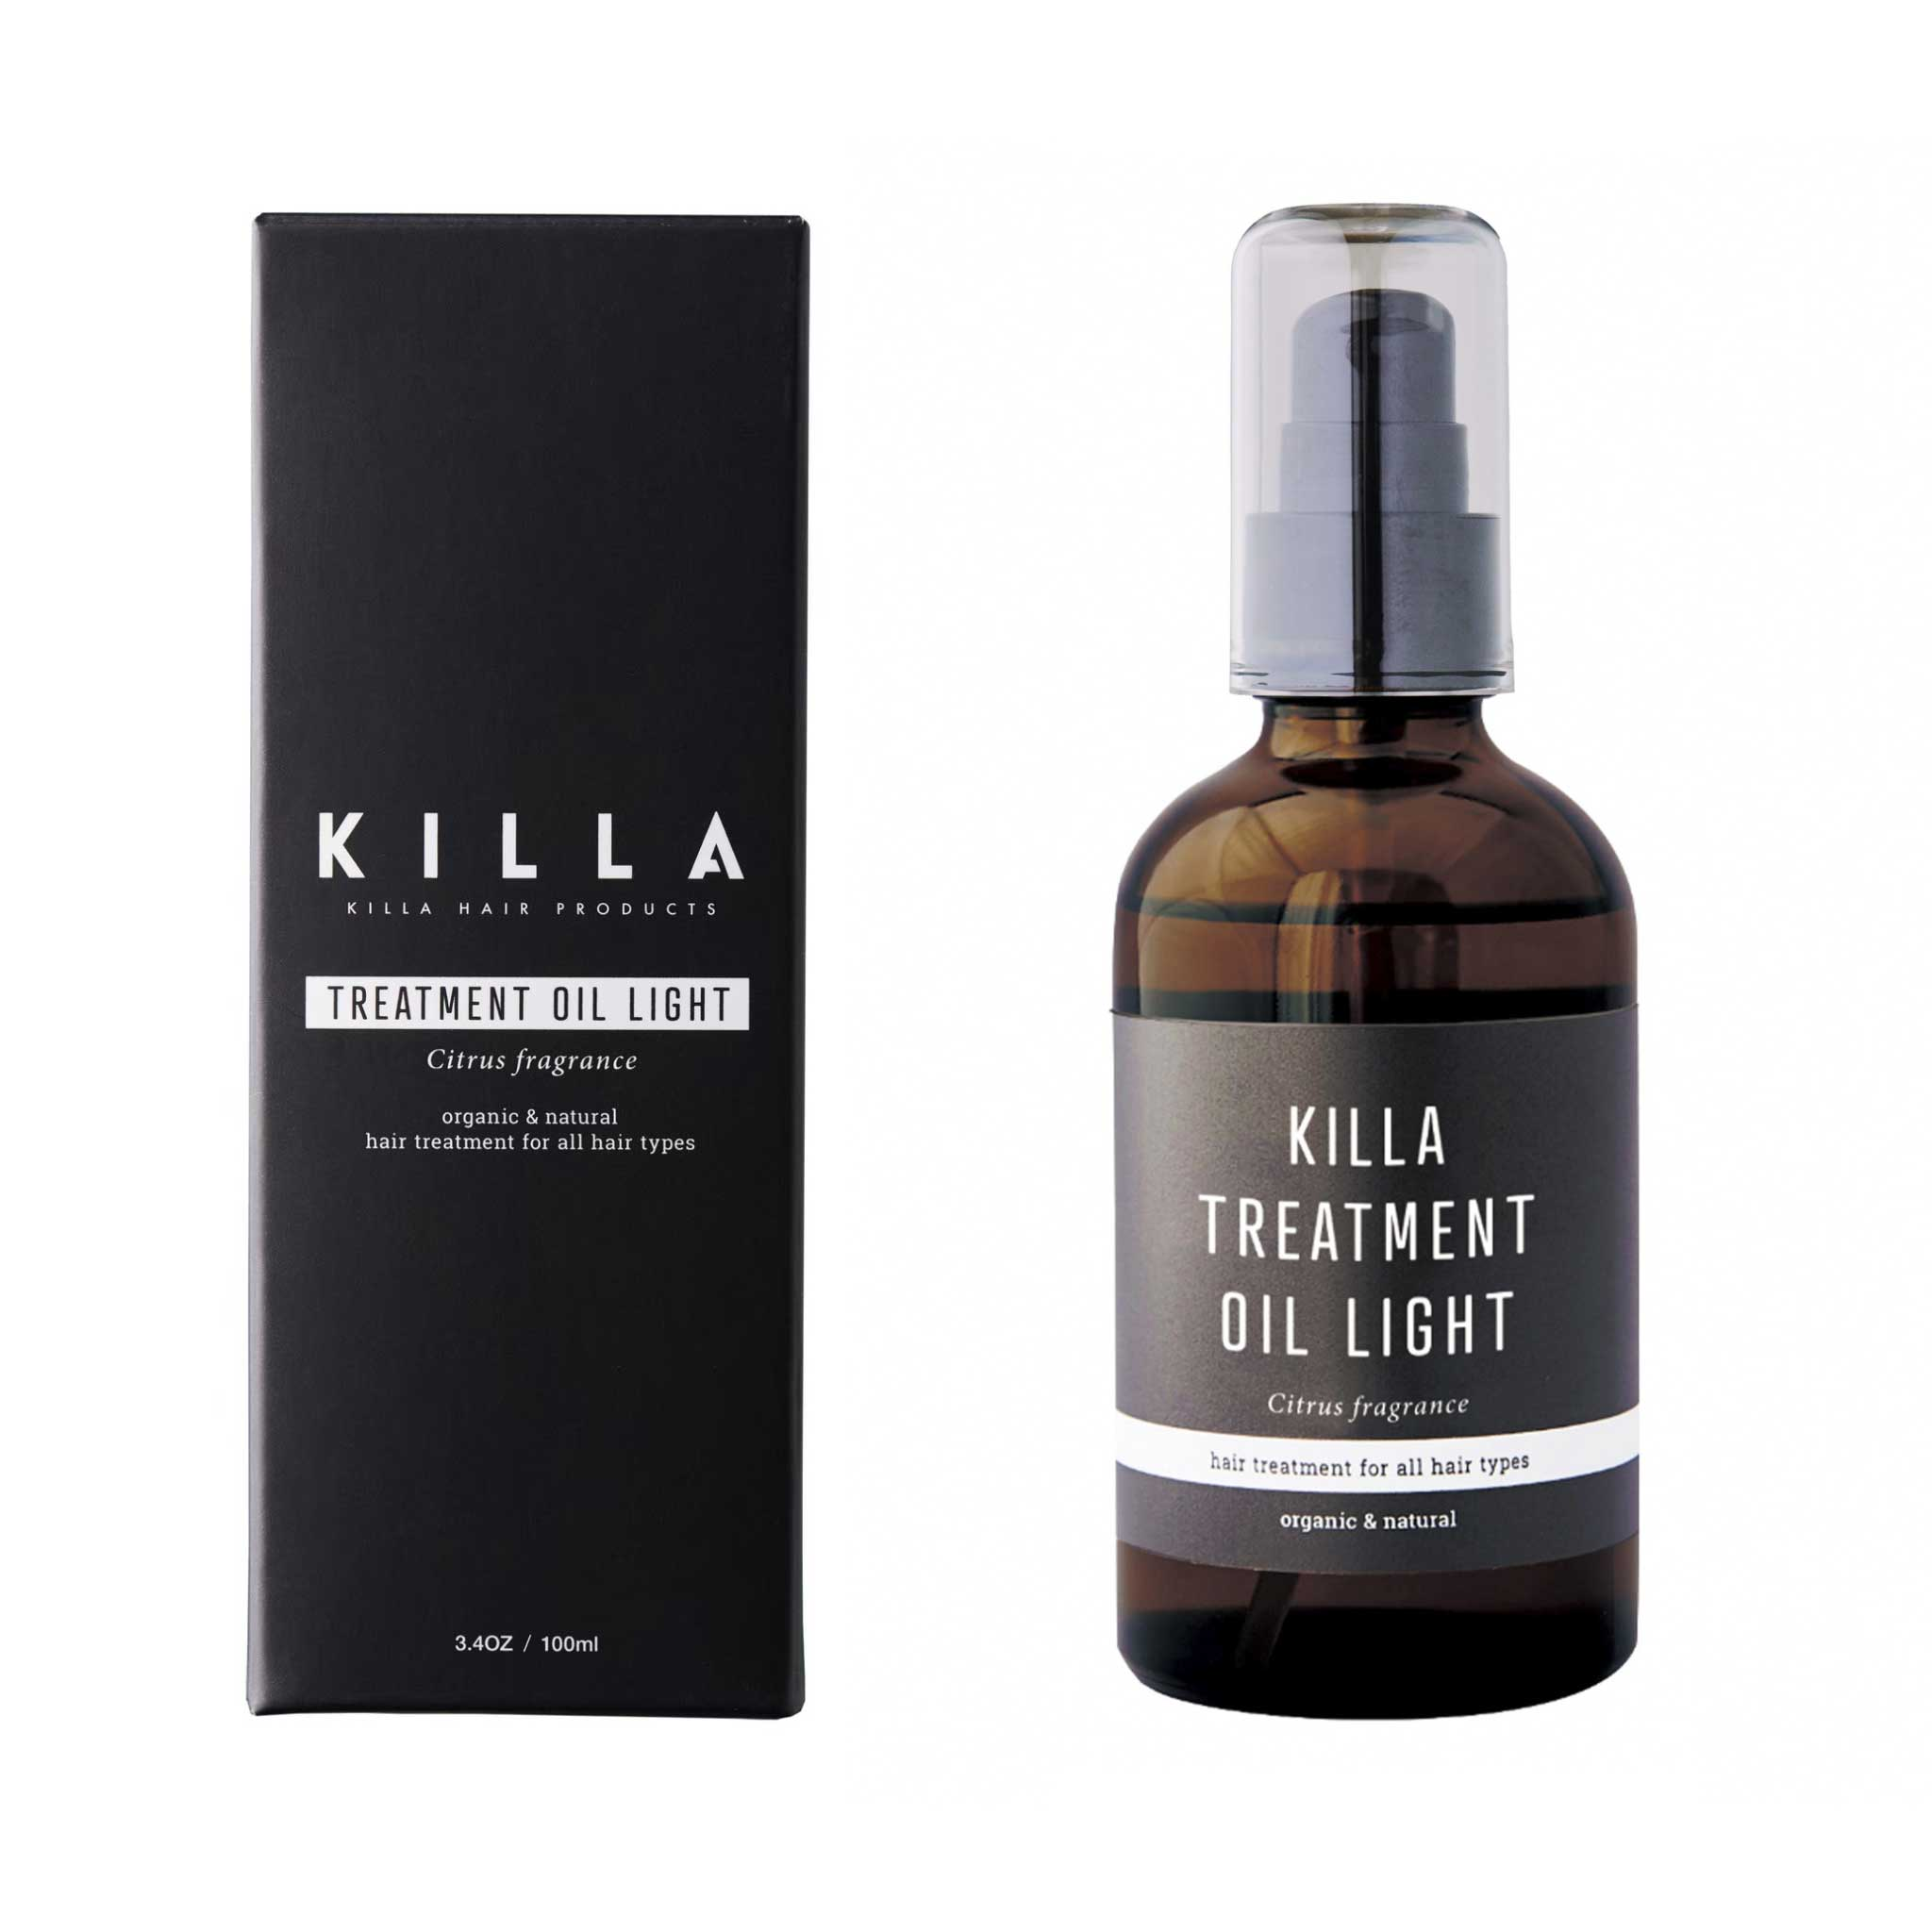 KILLA TREATMENT OIL LIGHT【キラ トリートメント オイル ライト】